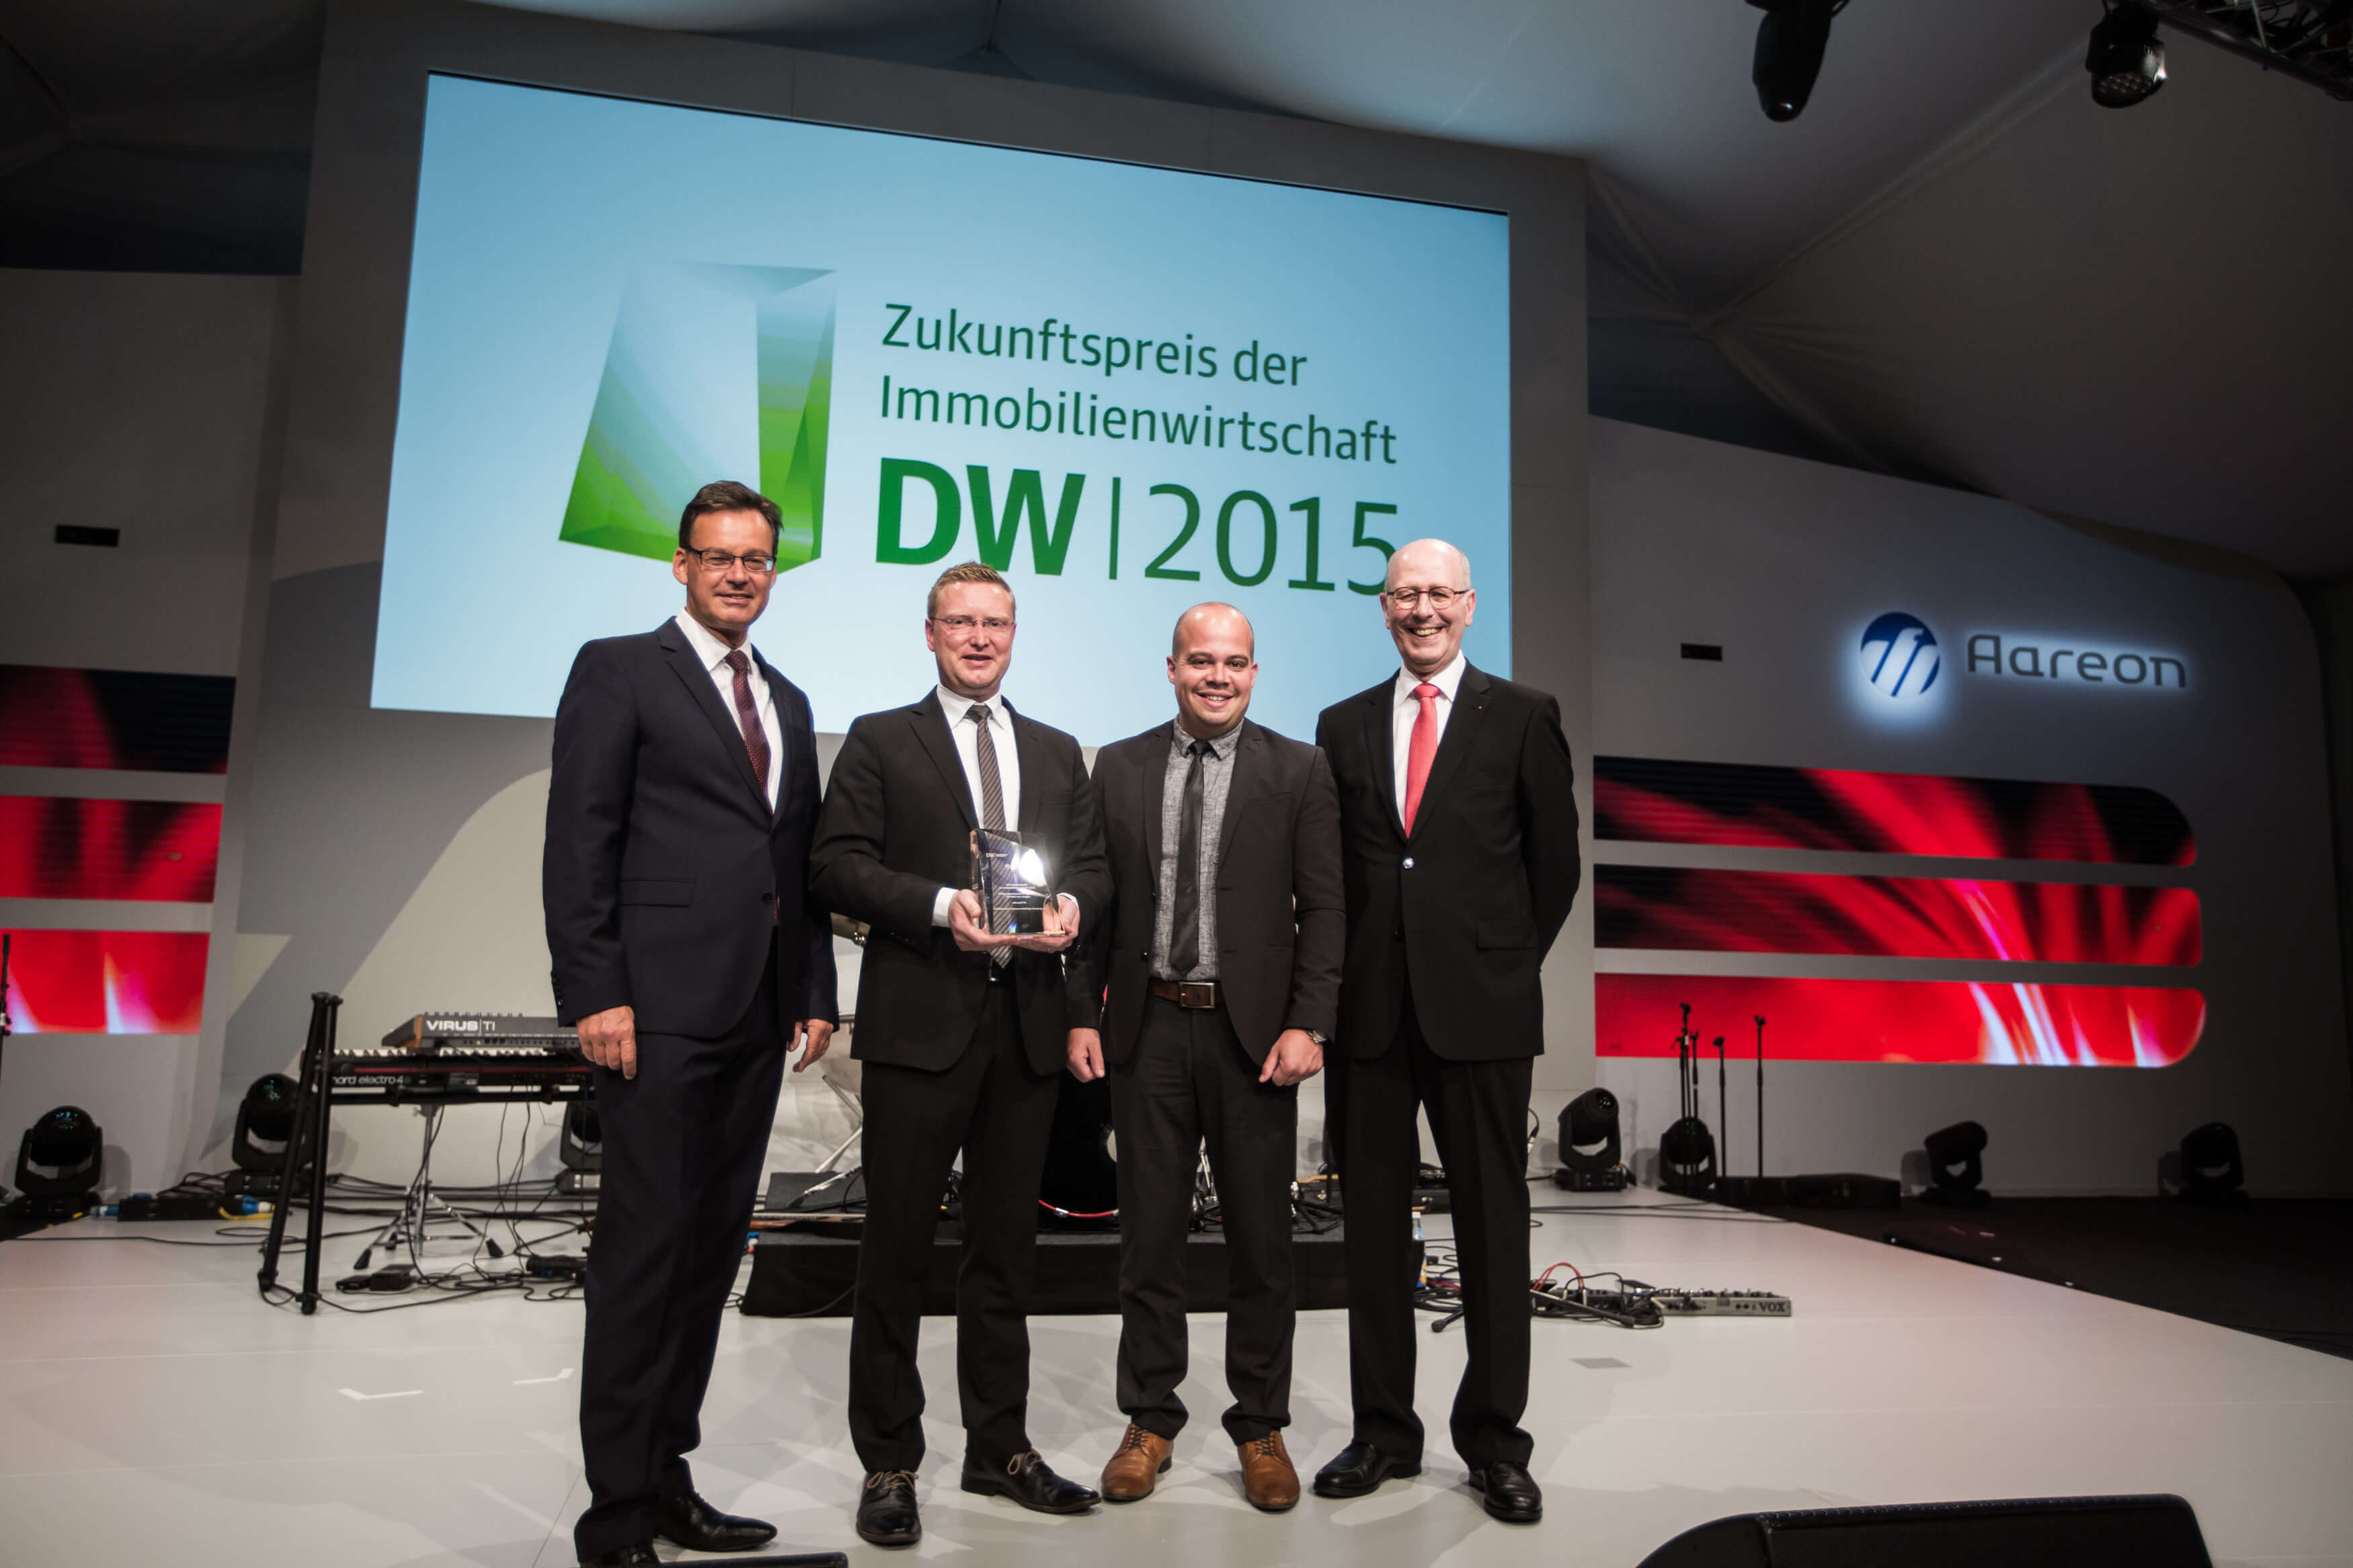 Gewinnerbild: Familienheim Schwarzwald-Baar-Heuberg eG